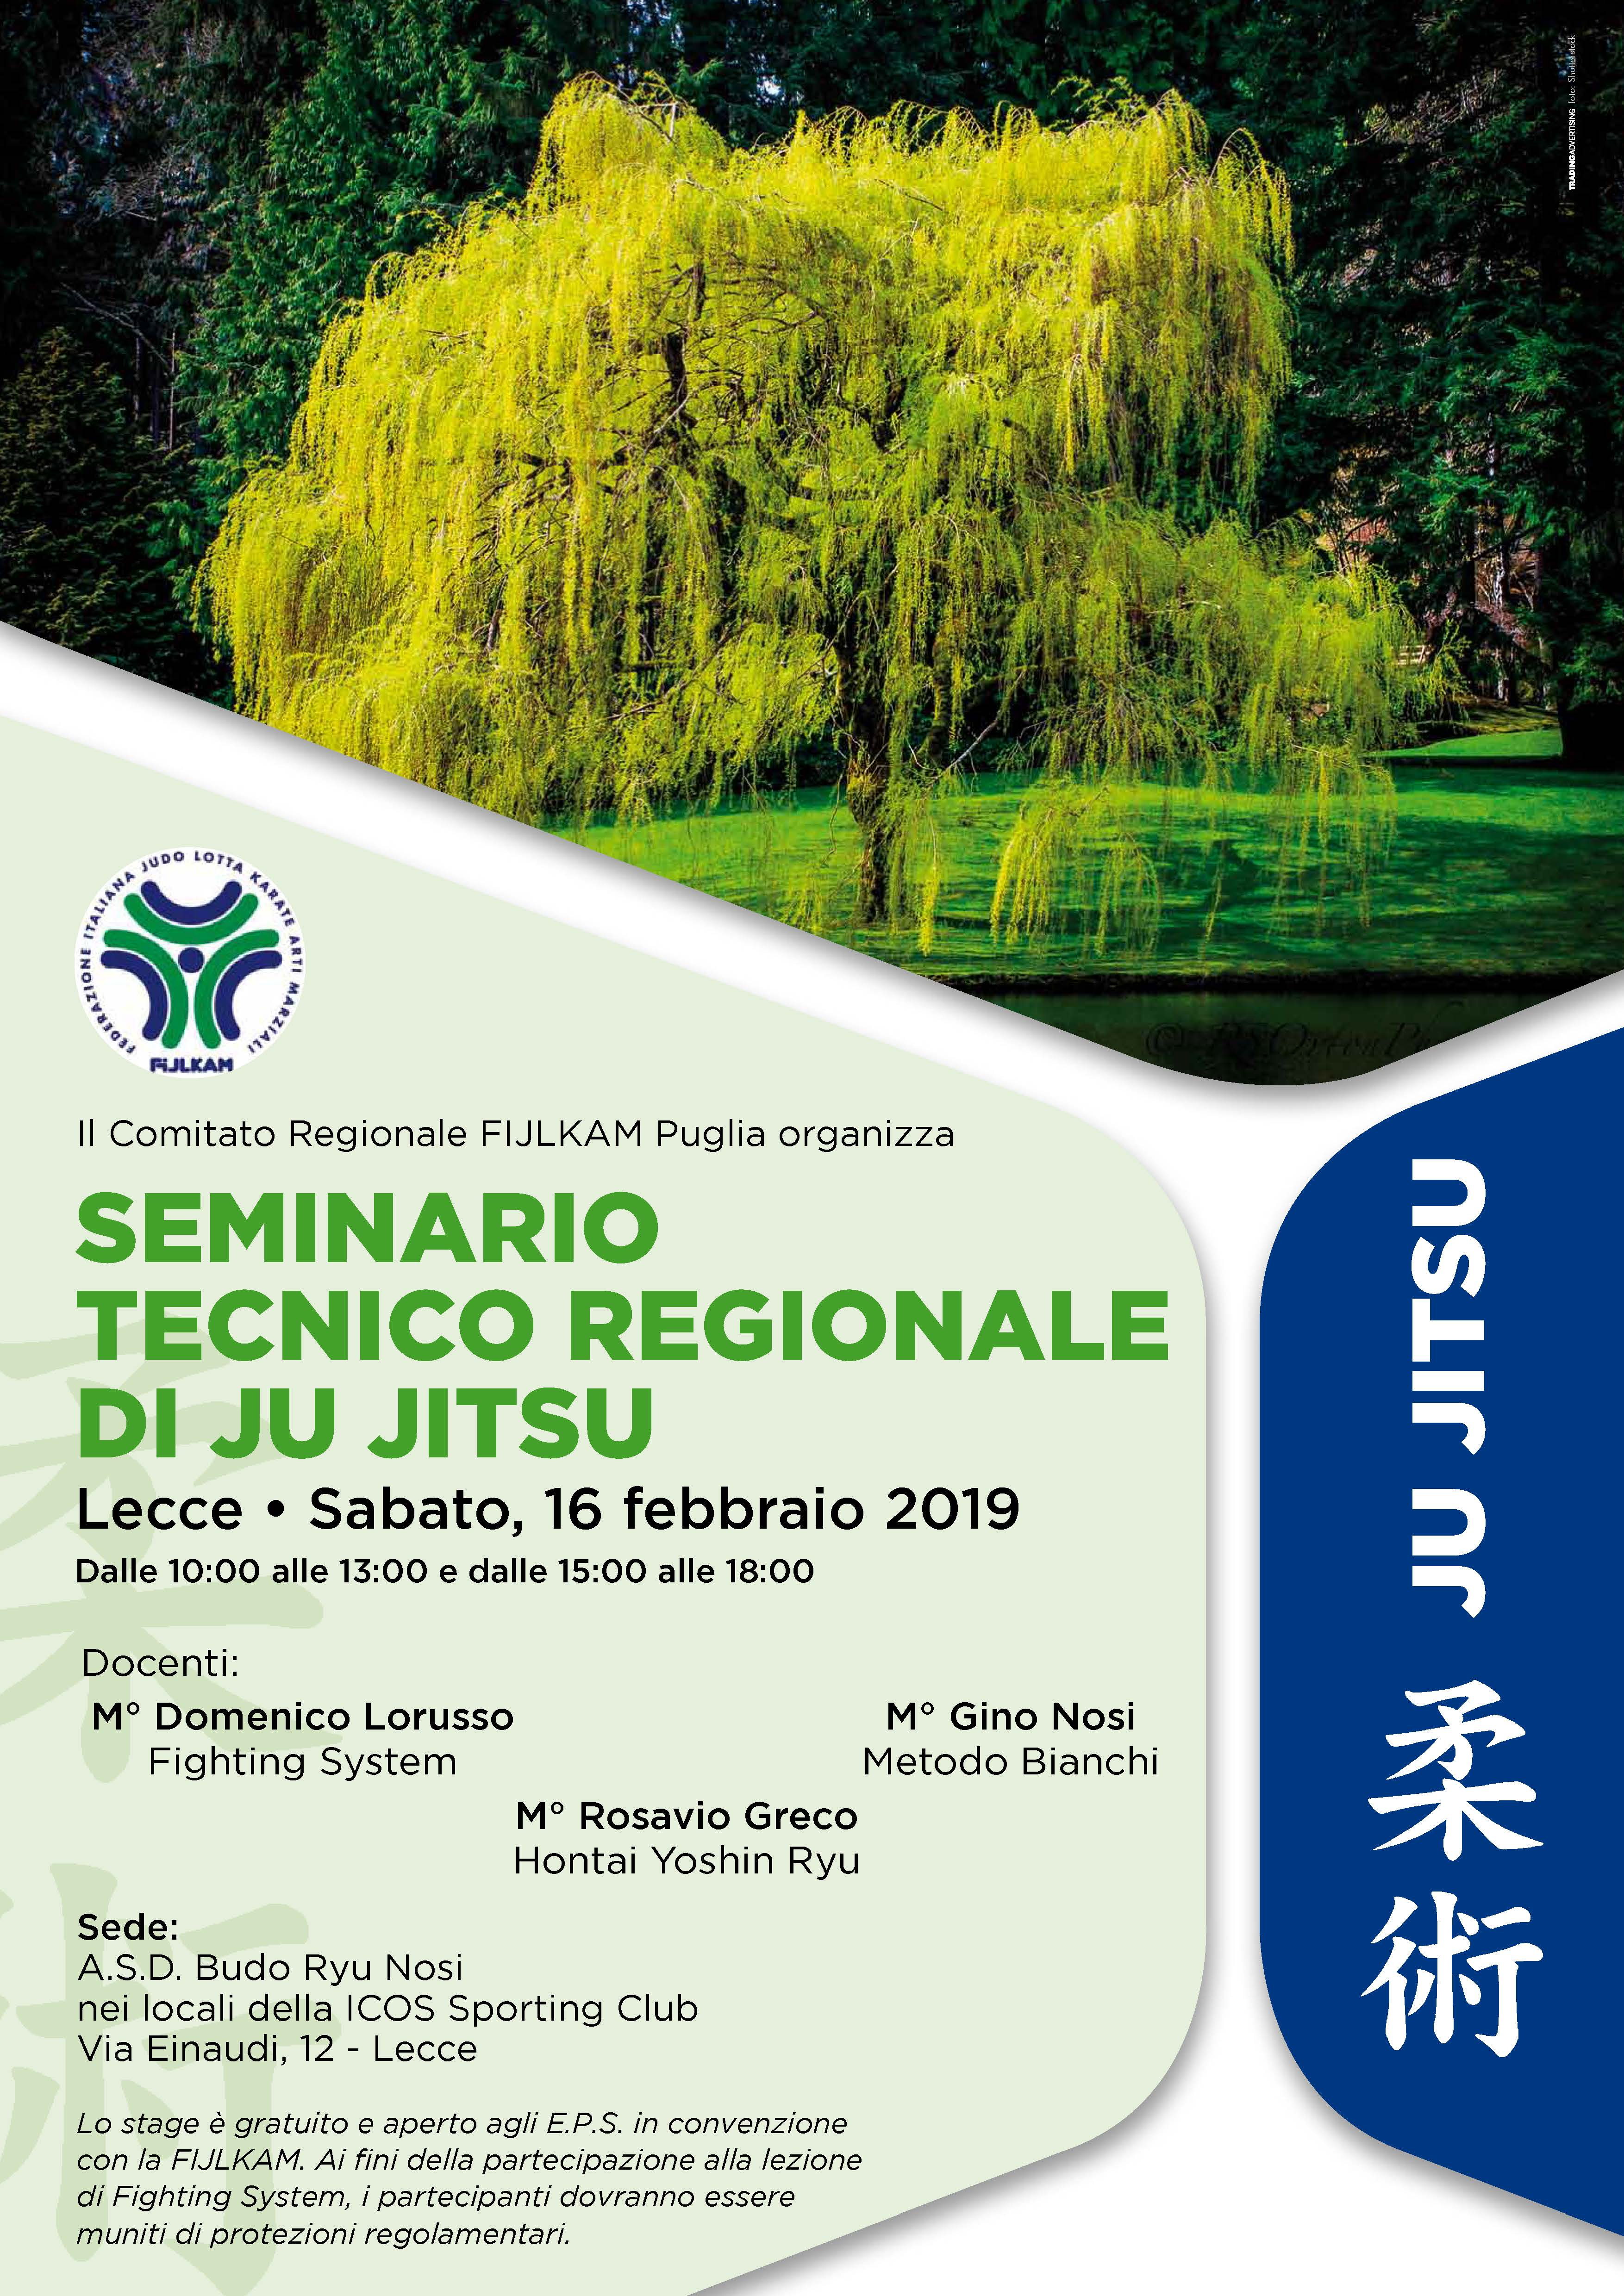 seminario-tecnico-regionale-ju-jitsu-16-02-2019